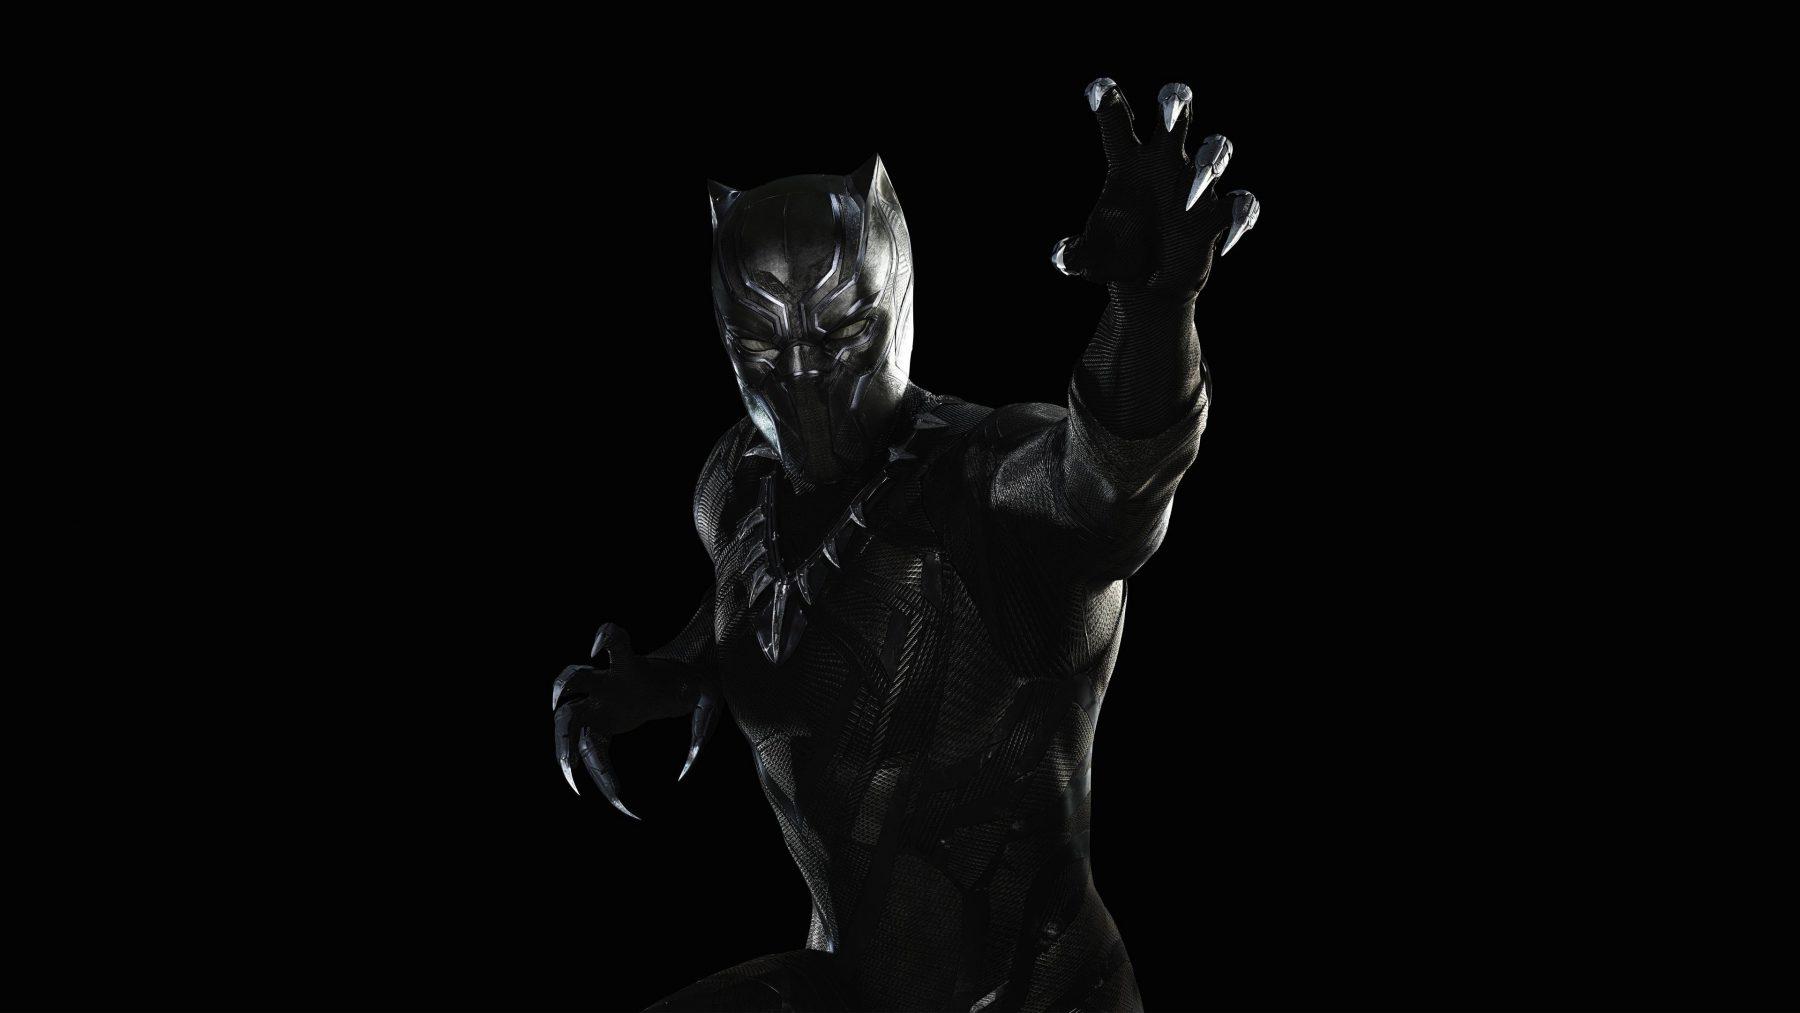 Simple Wallpaper Movie Black - Black-Panther-movie-10-1800x1013  You Should Have_463097.jpg